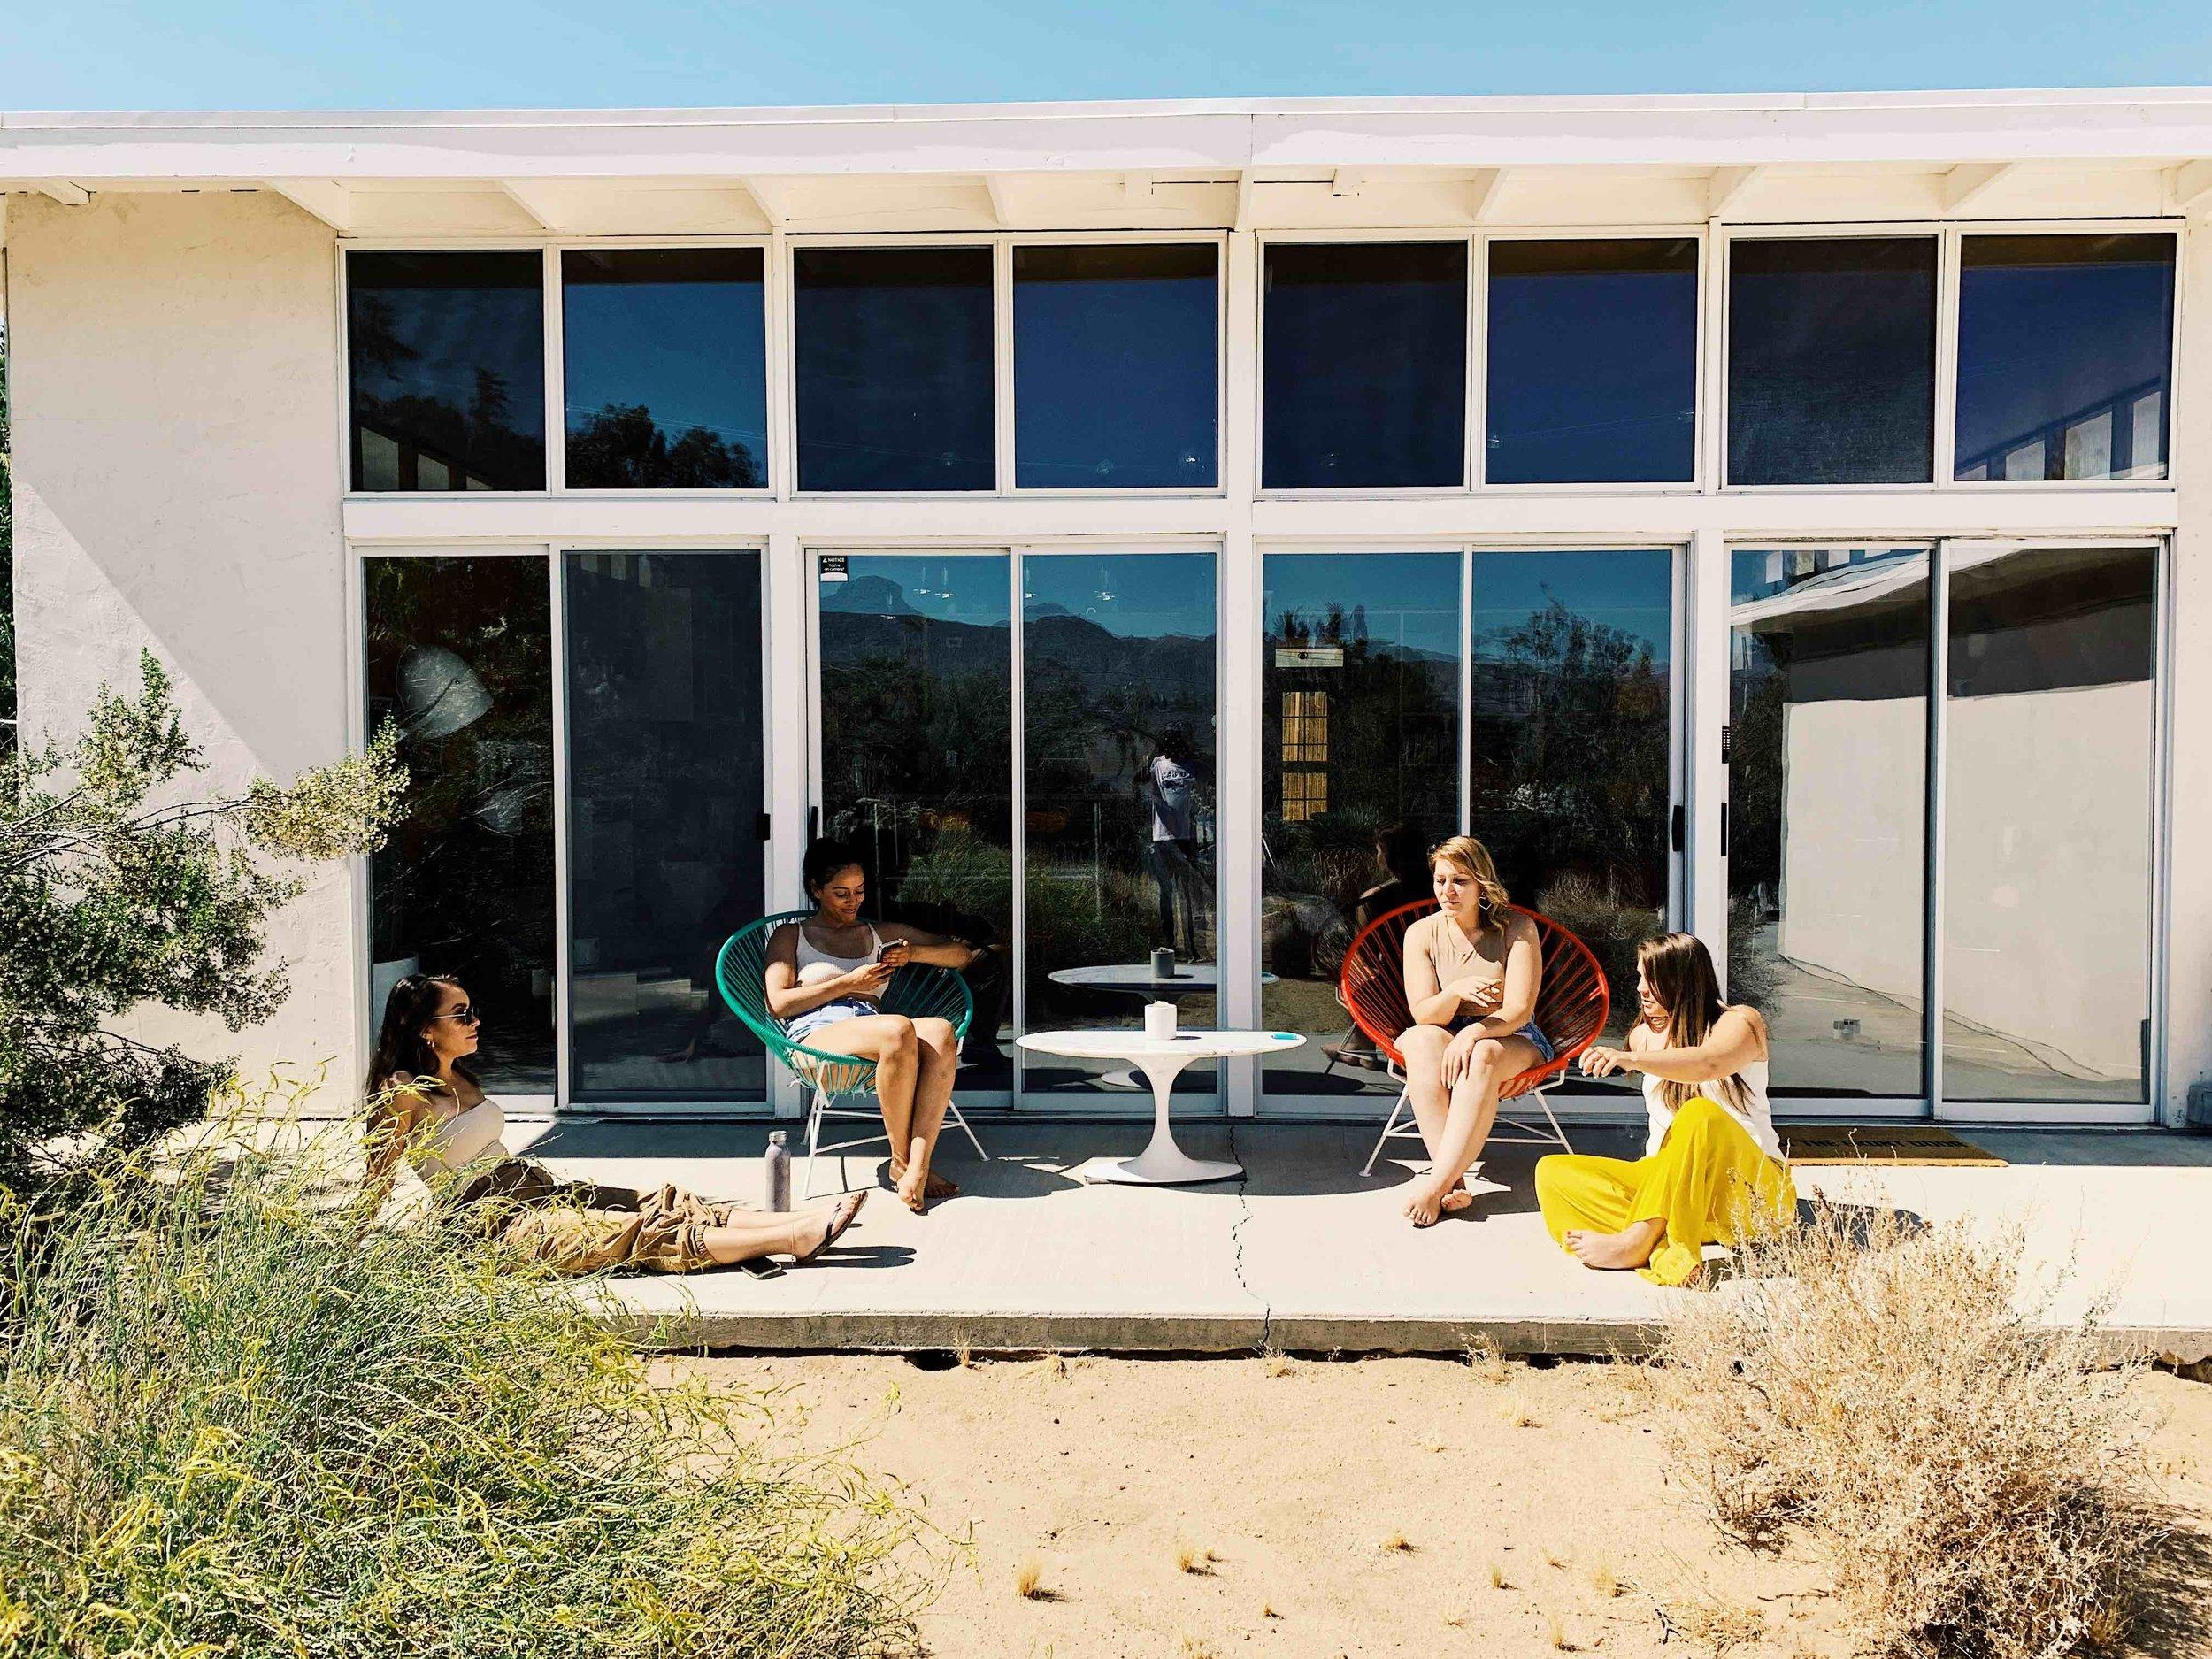 airbnb-art loft-joshua tree - 26.jpg